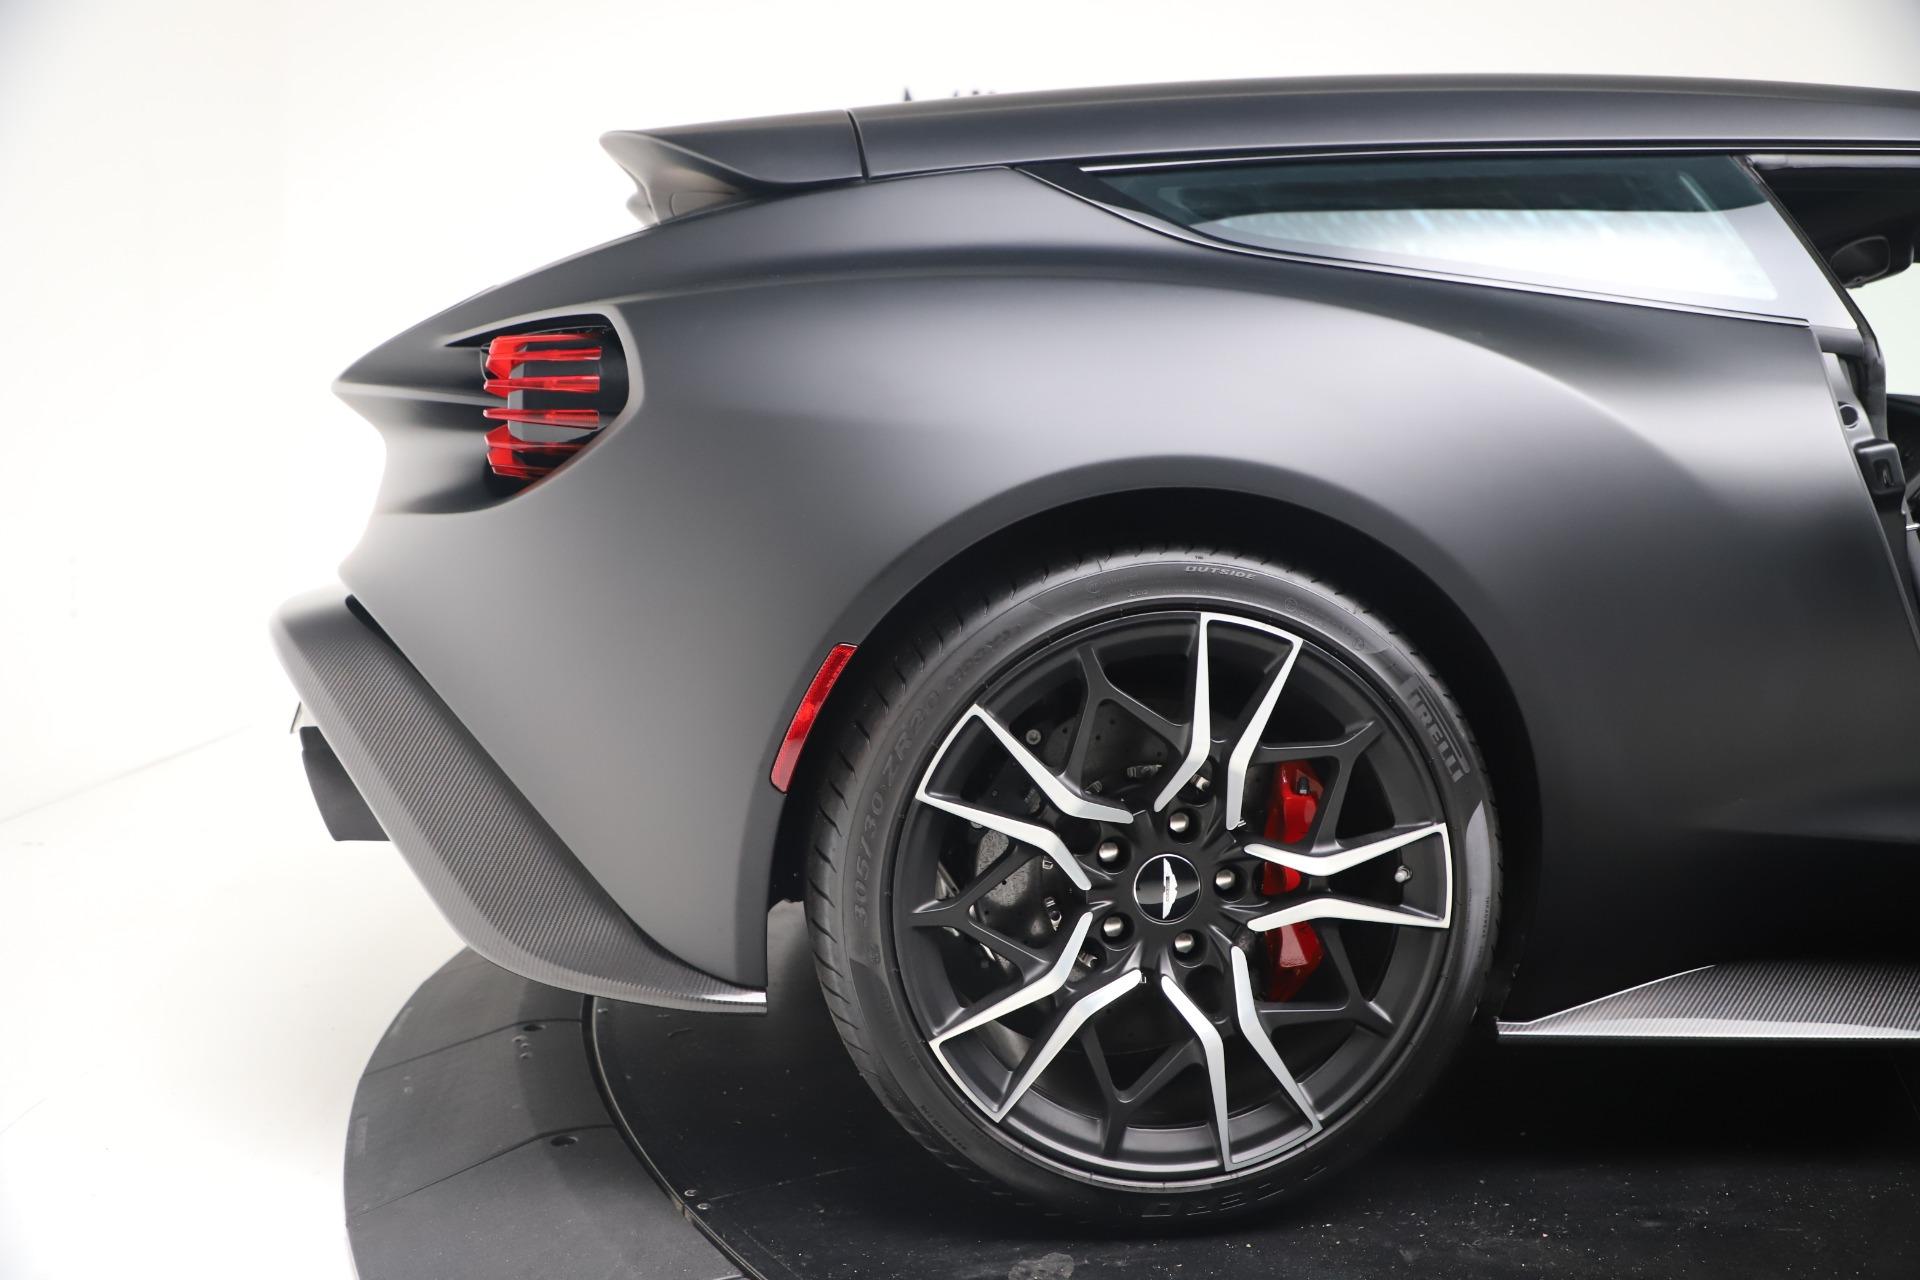 New 2019 Aston Martin Vanquish Shooting Brake For Sale In Westport, CT 3512_p29